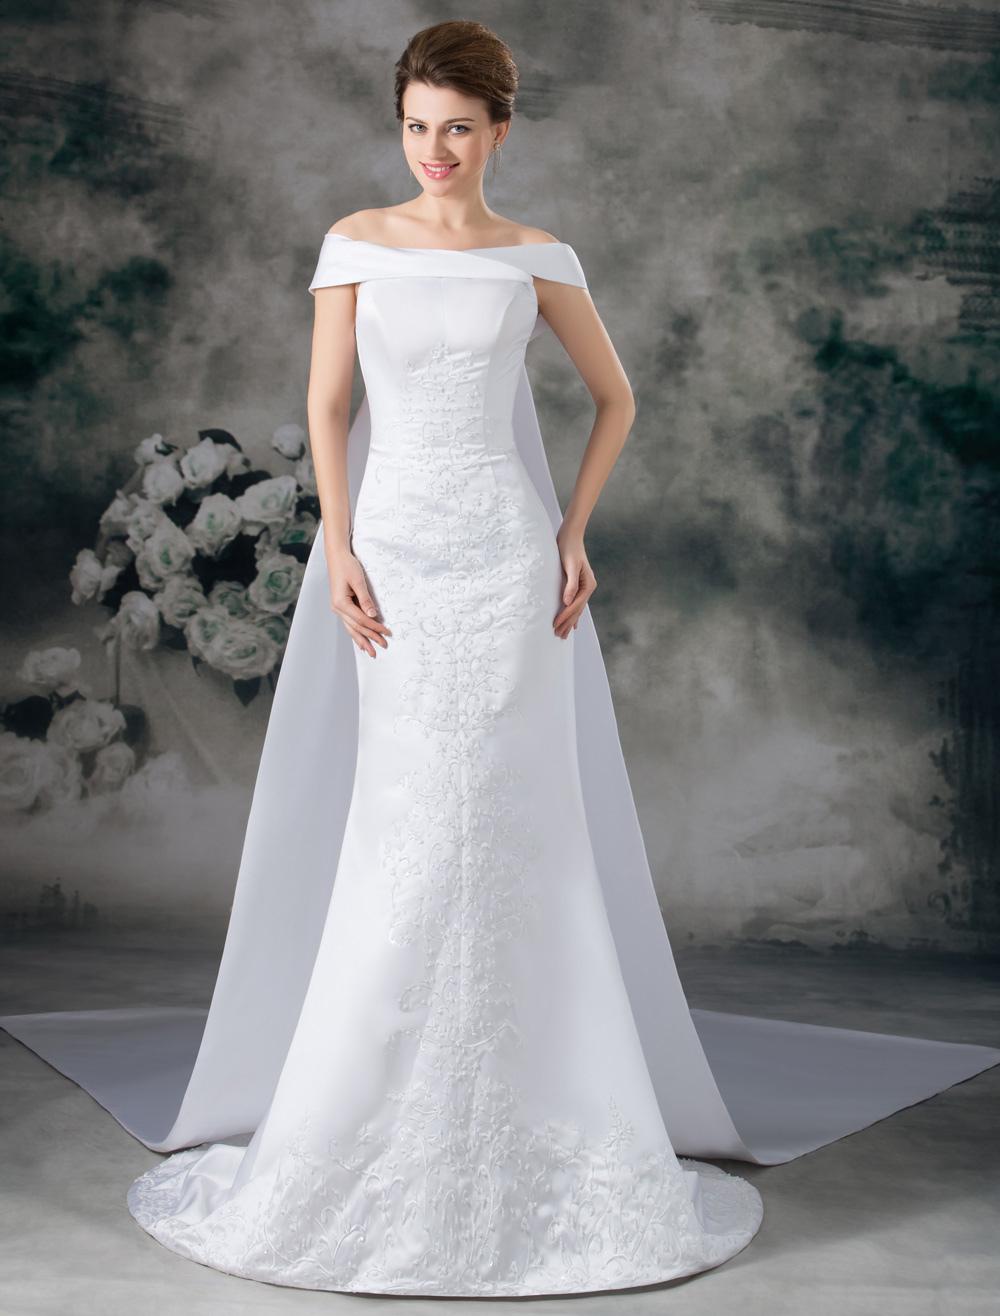 White Sheath Off-The-Shoulder Beading Satin Bridal Wedding Gown